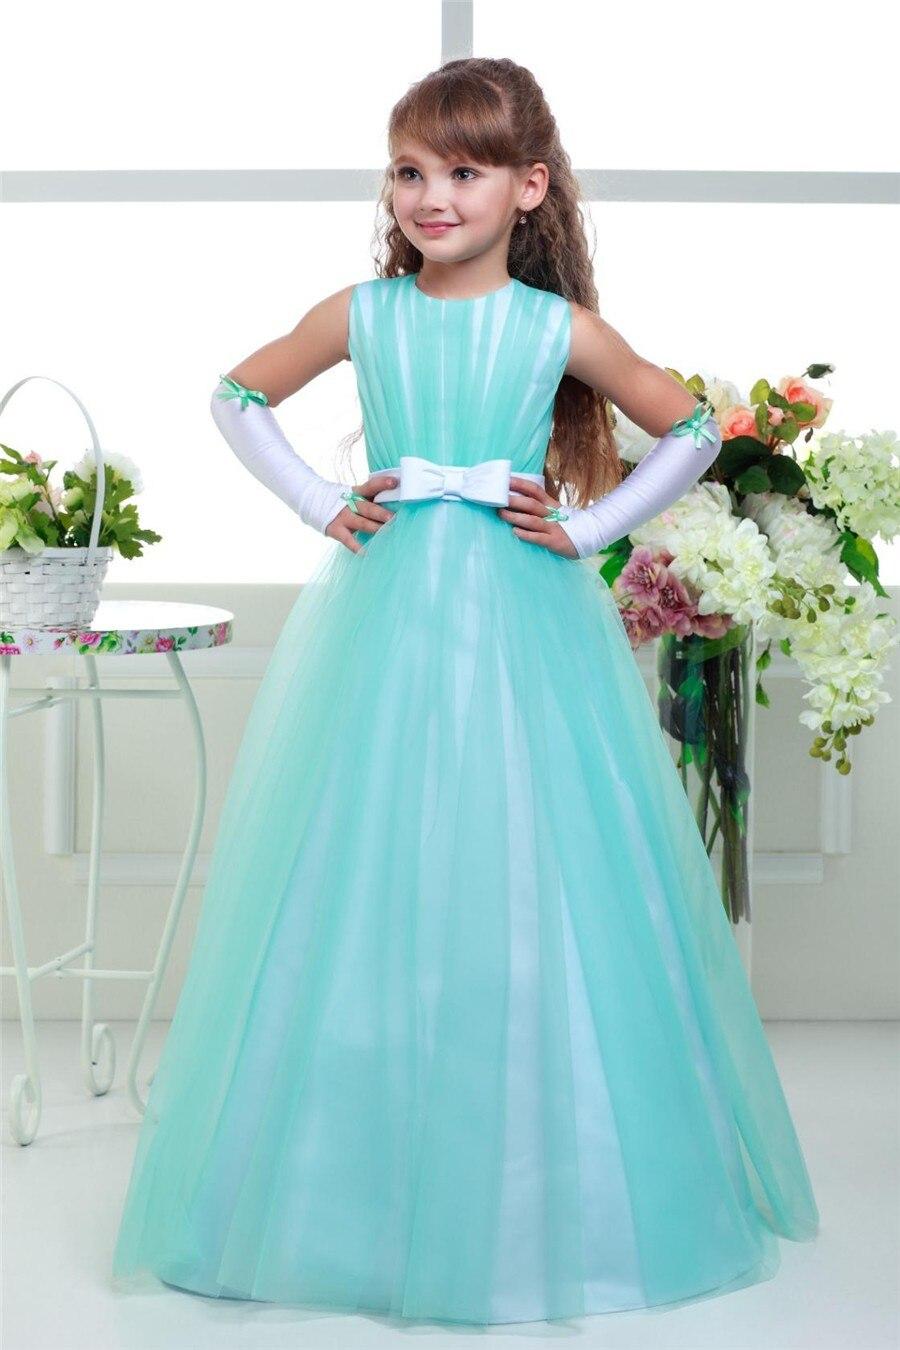 First Communion Dresses Macy\'s | Dress images